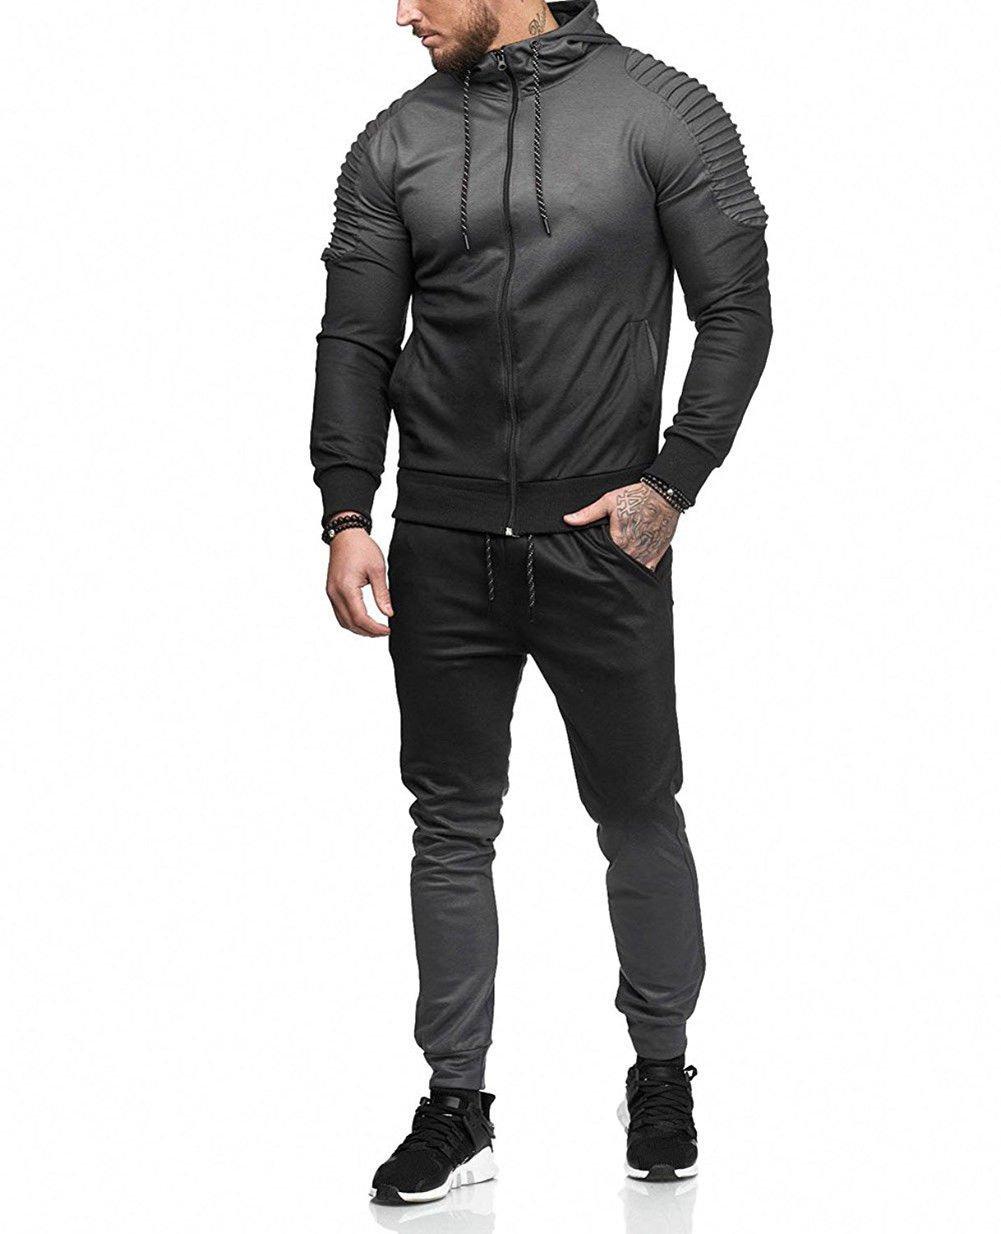 Men's 2 Piece Casual Gradient Sport Suit Contrast Jogging Full Sweatsuit Tracksuit Outfit Zipper Hoodies Jacket Coat and Pant (Gray, M)